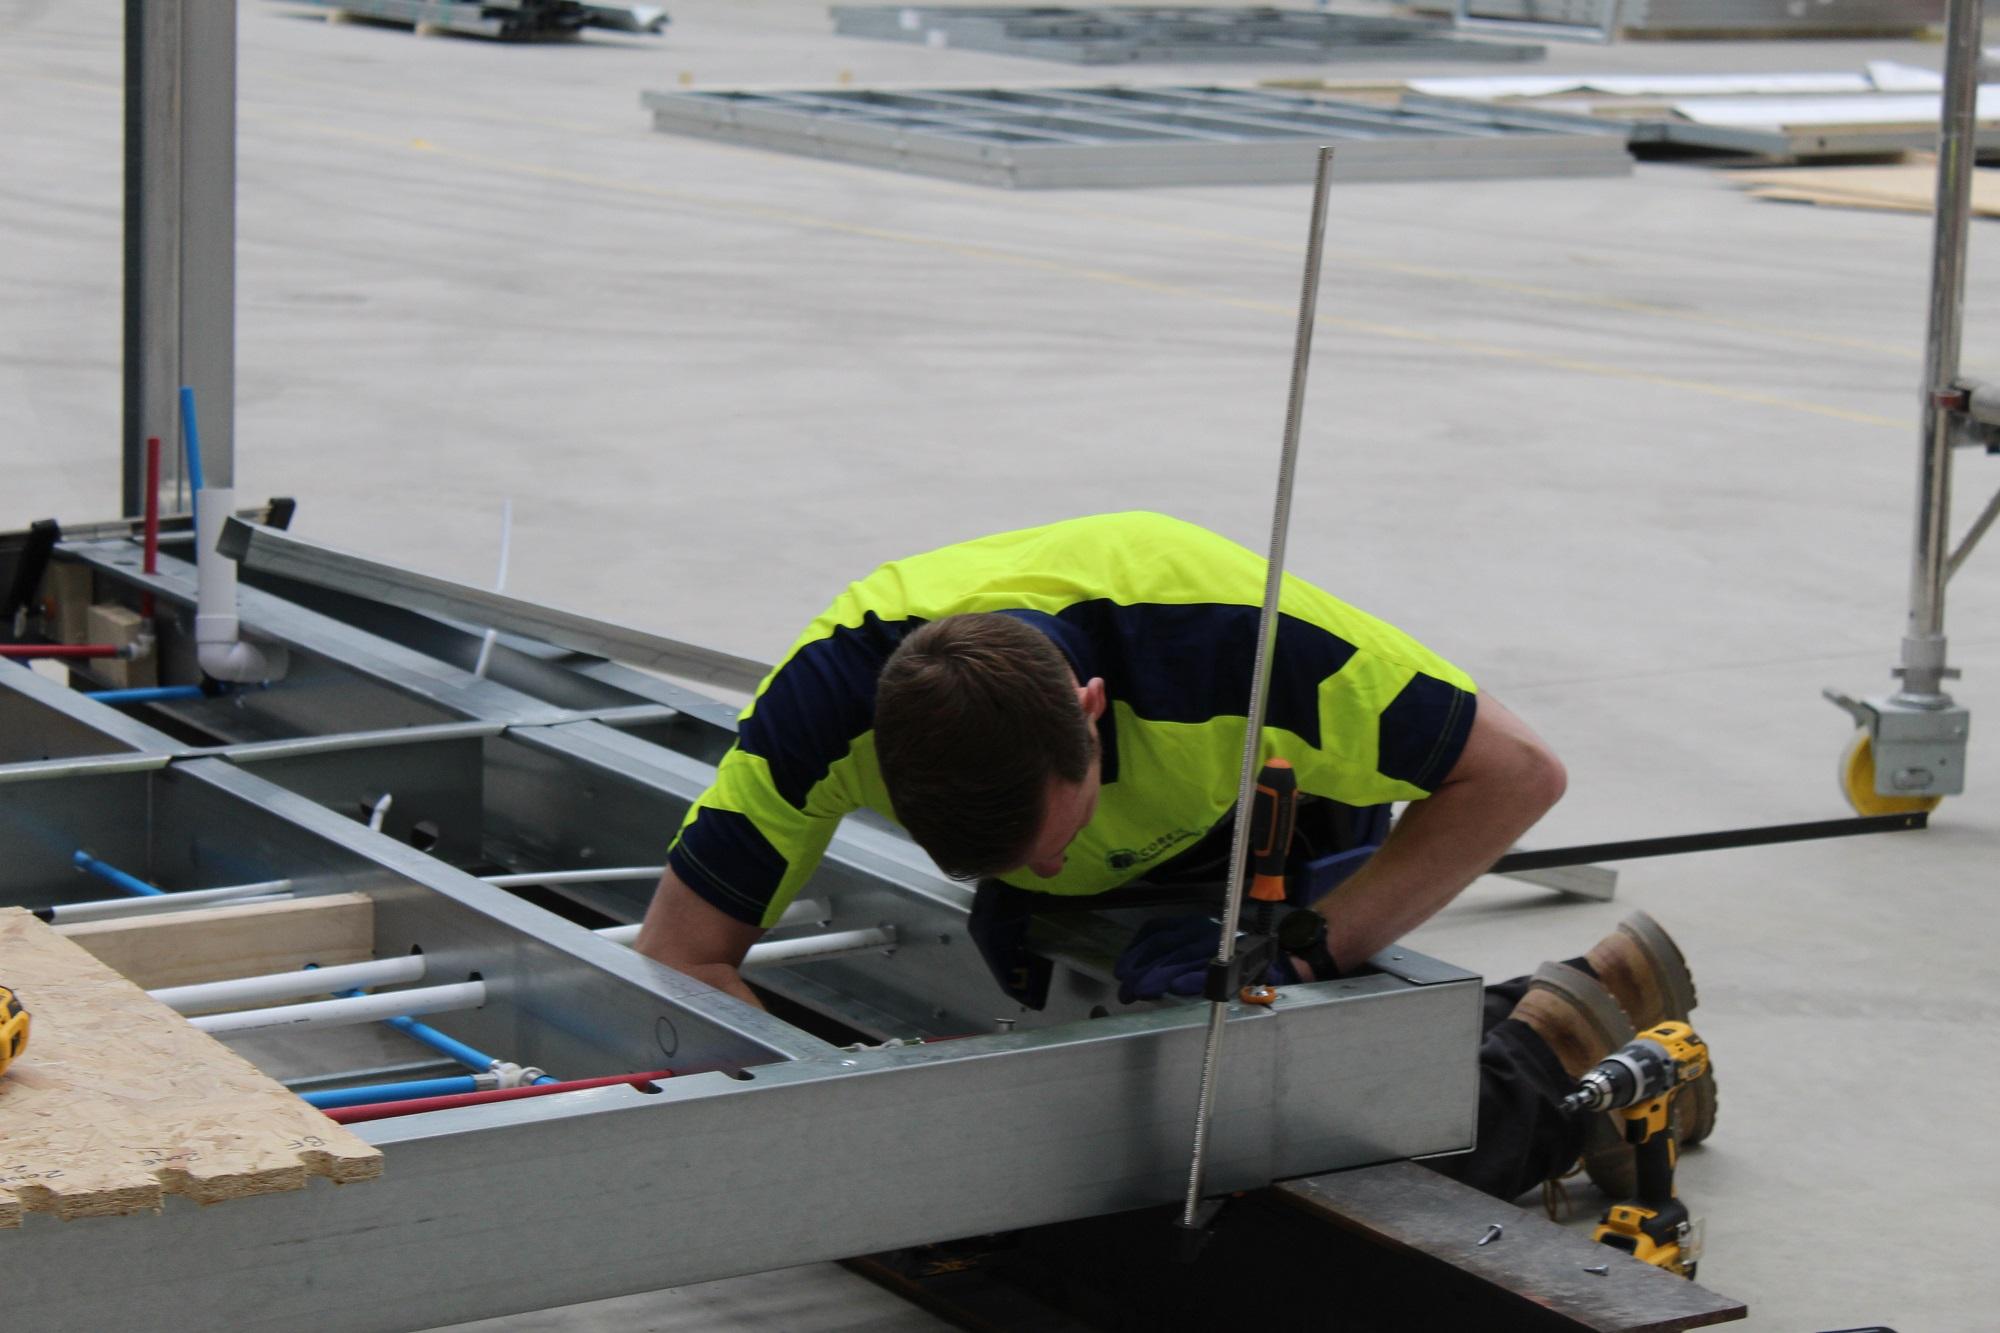 CoreHaus worker constructing modular housing unit